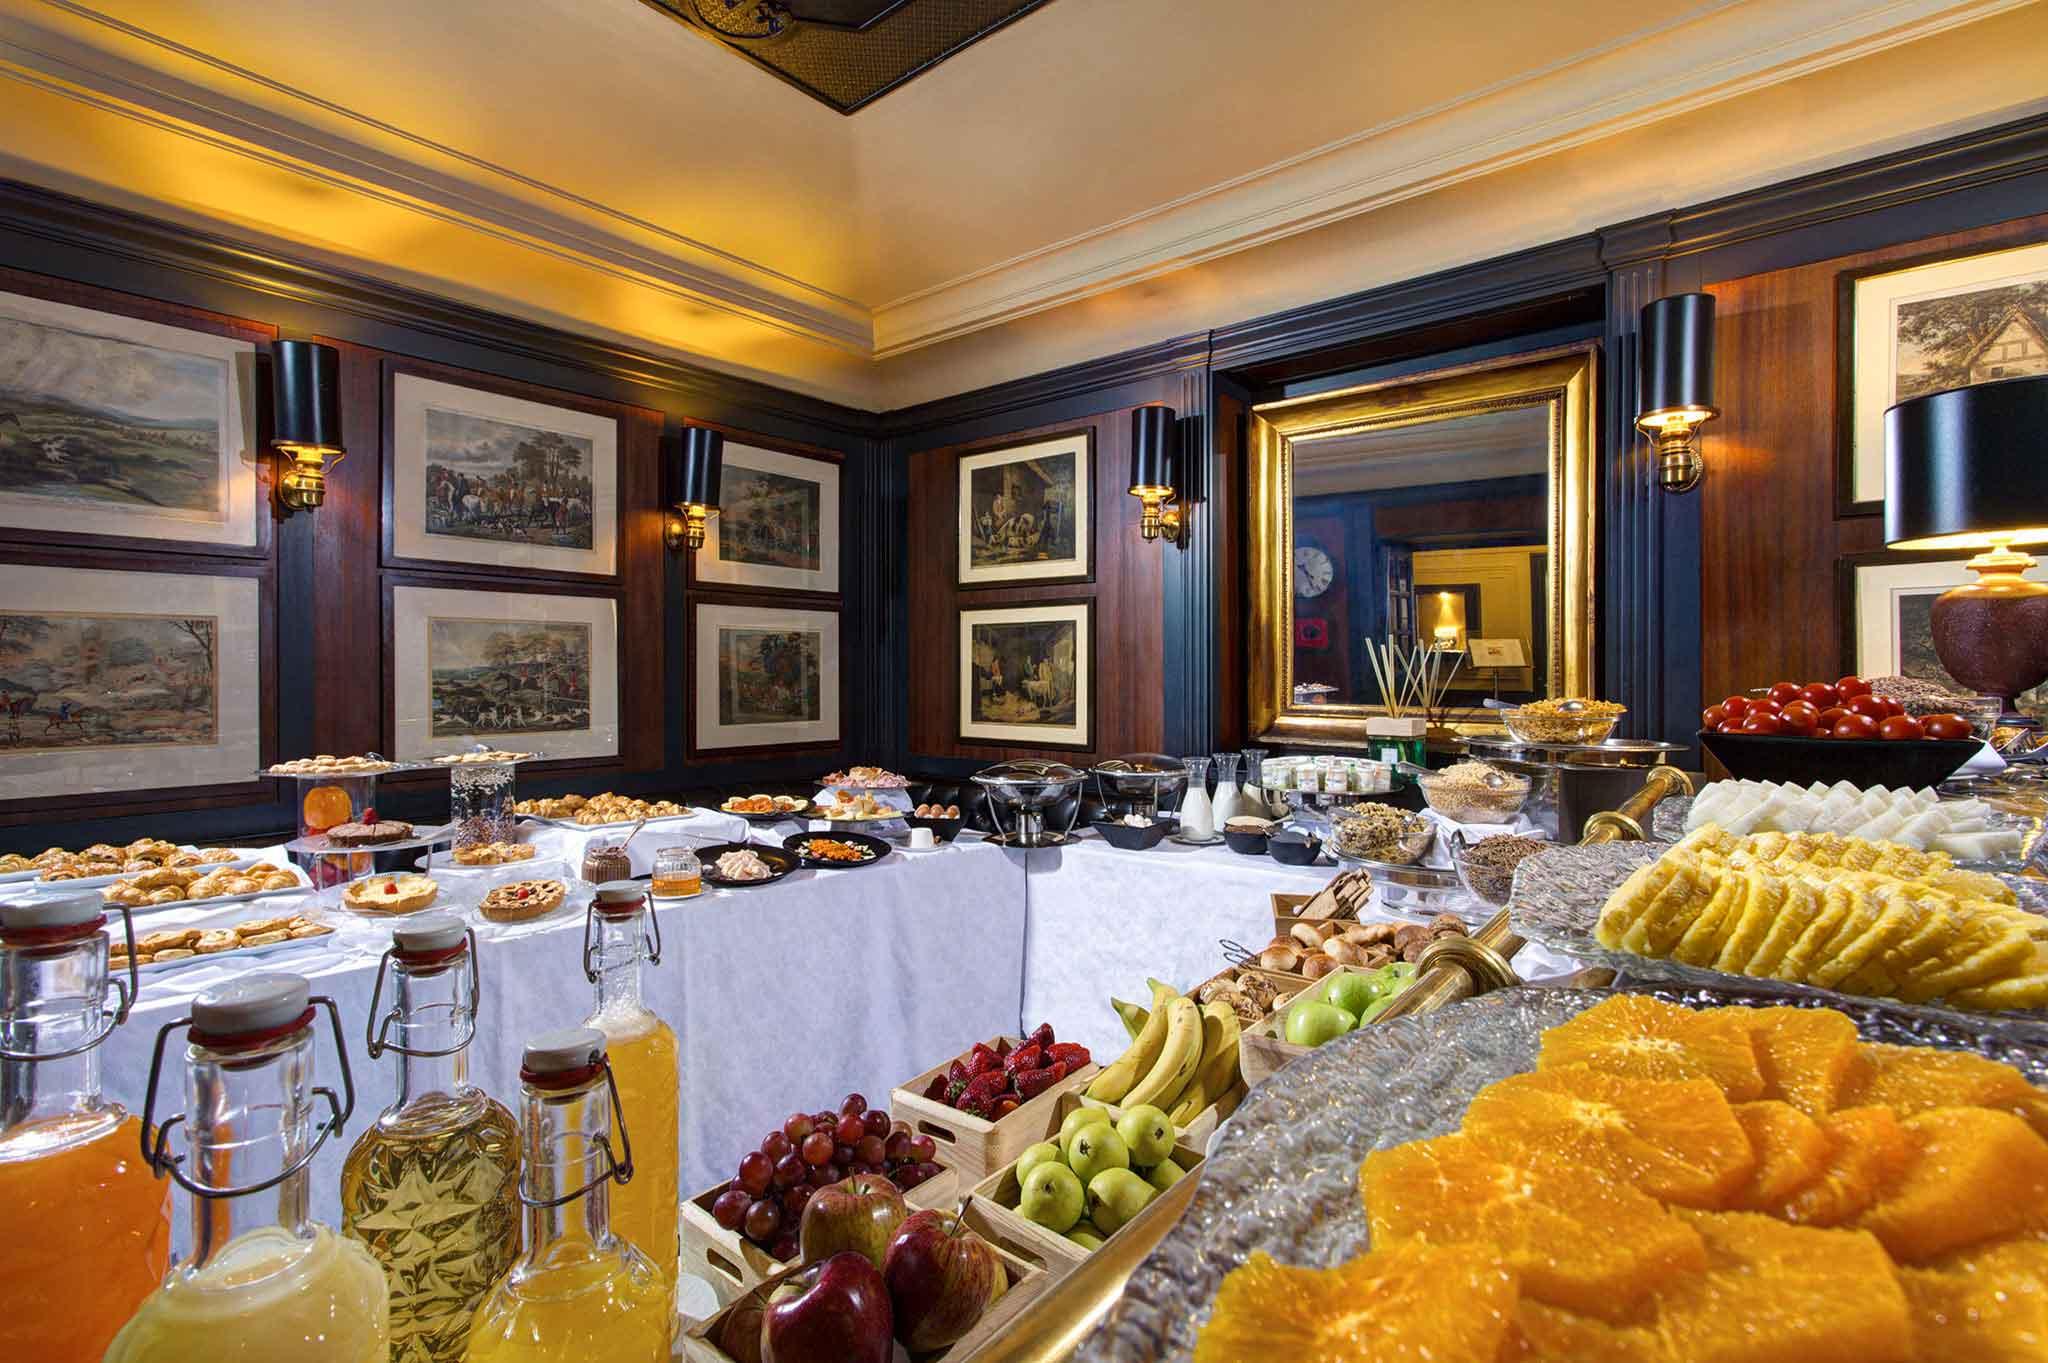 Photo Gallery Of Hotel D Inghilterra Rome Starhotels Collezione